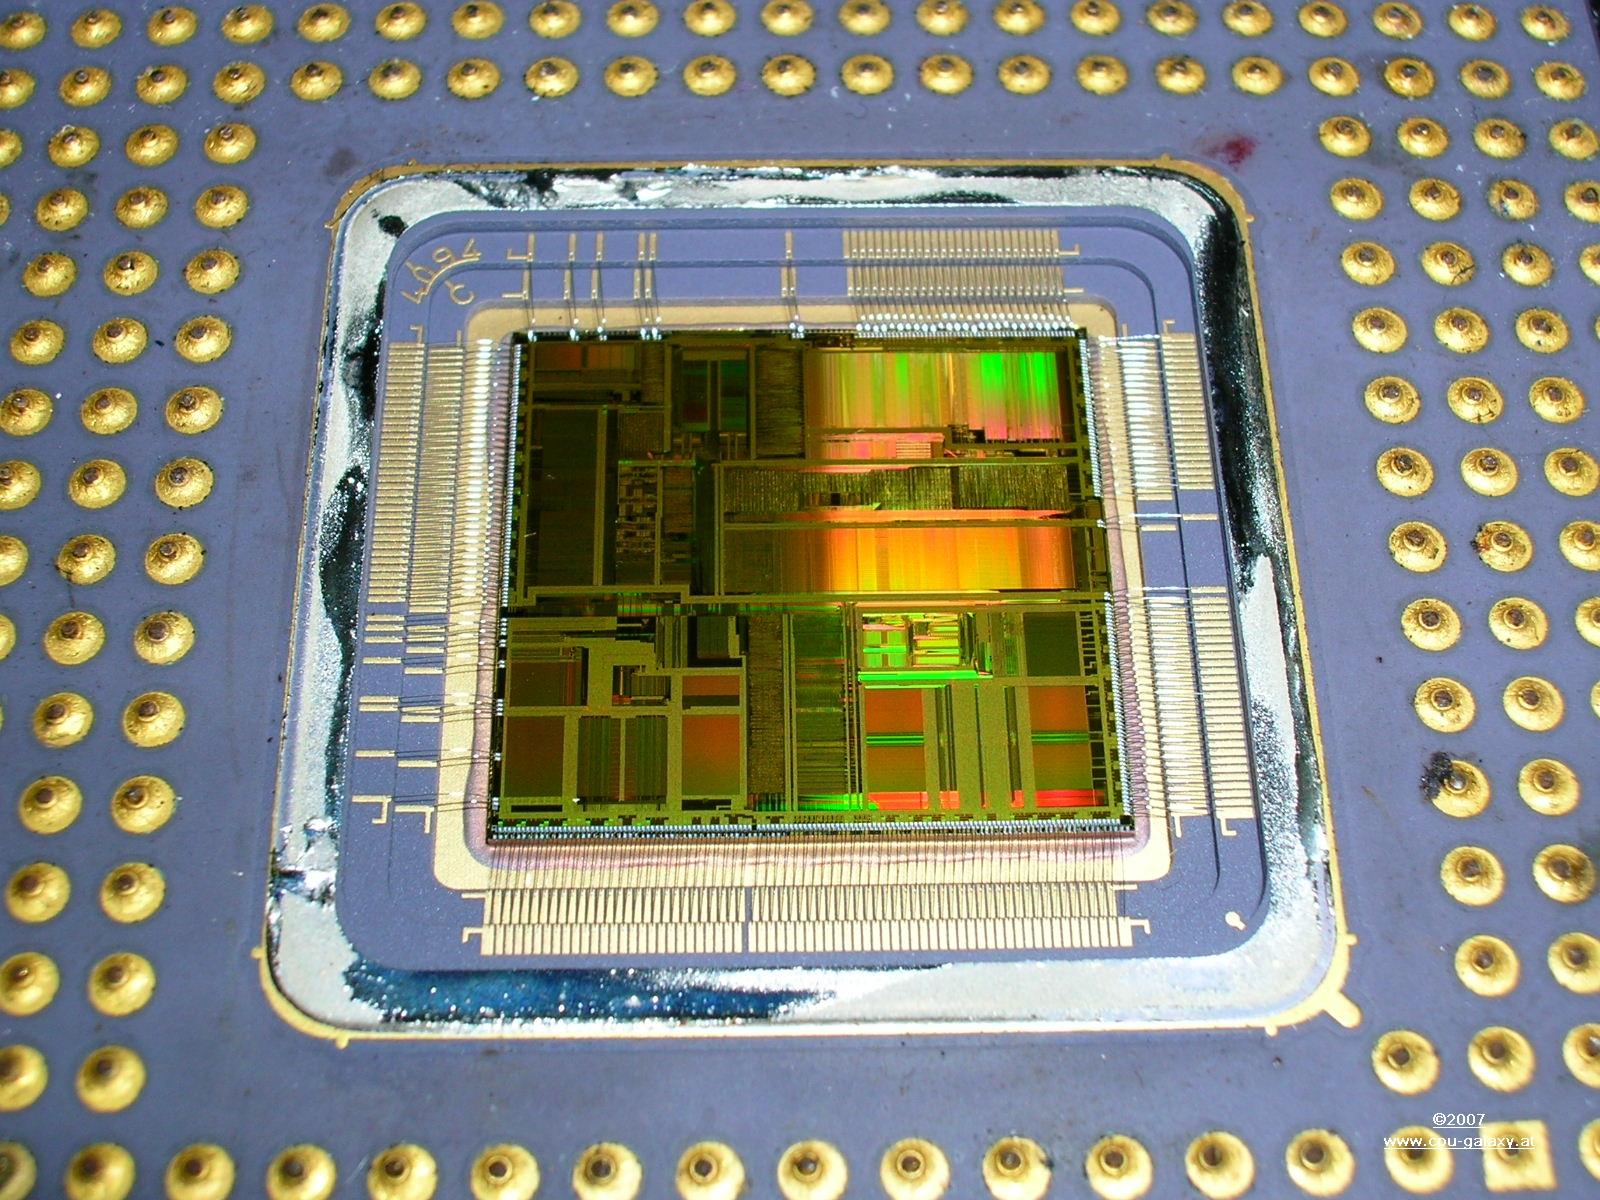 Pentium? Core i5? Core i7? Making sense of Intel's convoluted CPU lineup